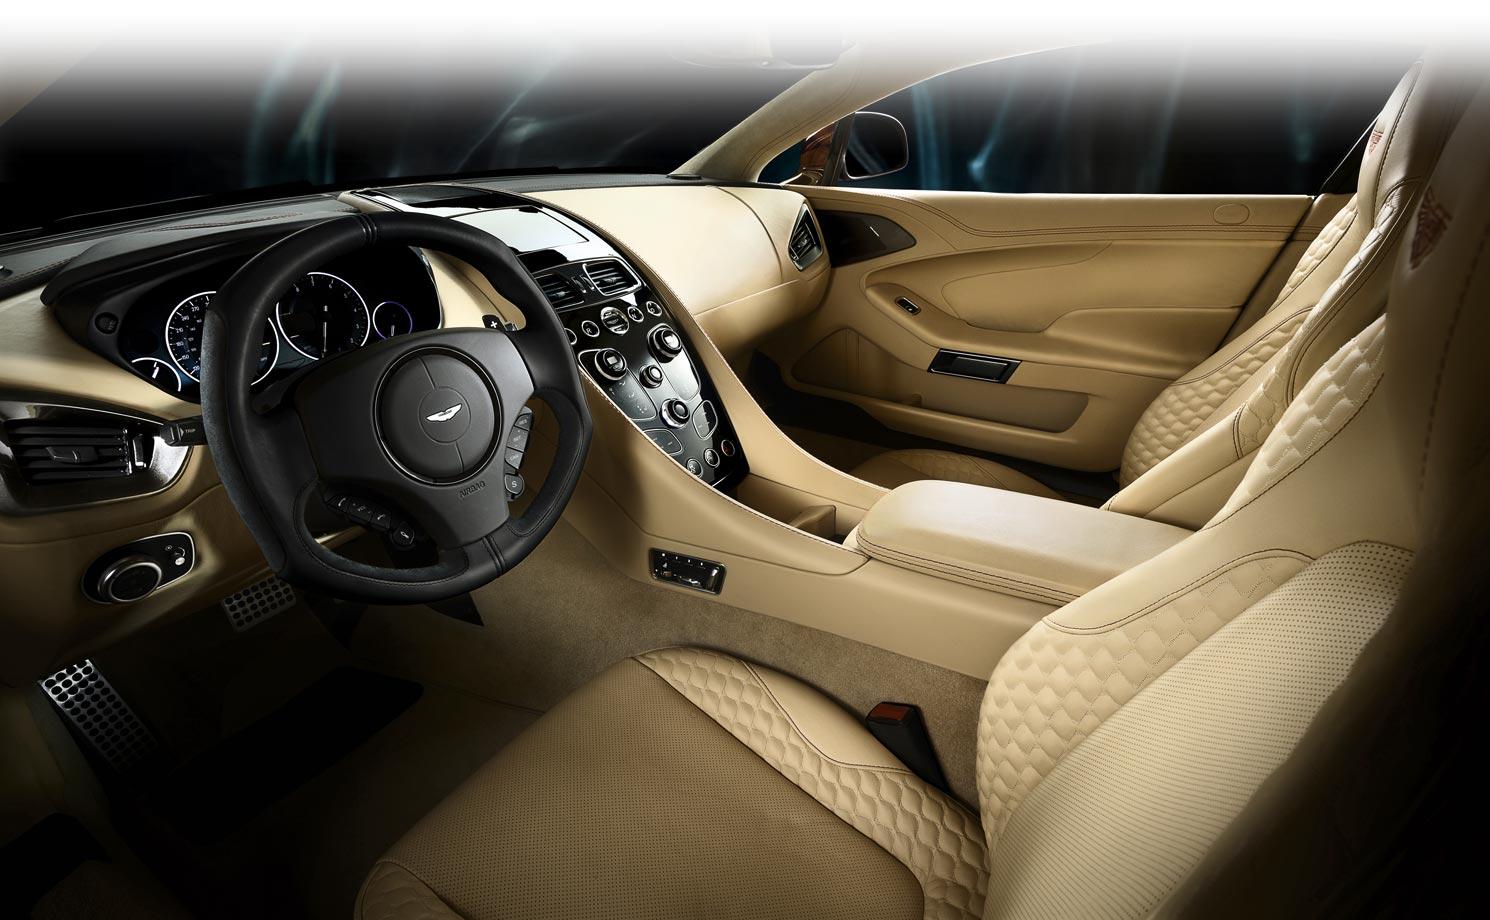 aston martin interior. we redefined luxury aston martin interior